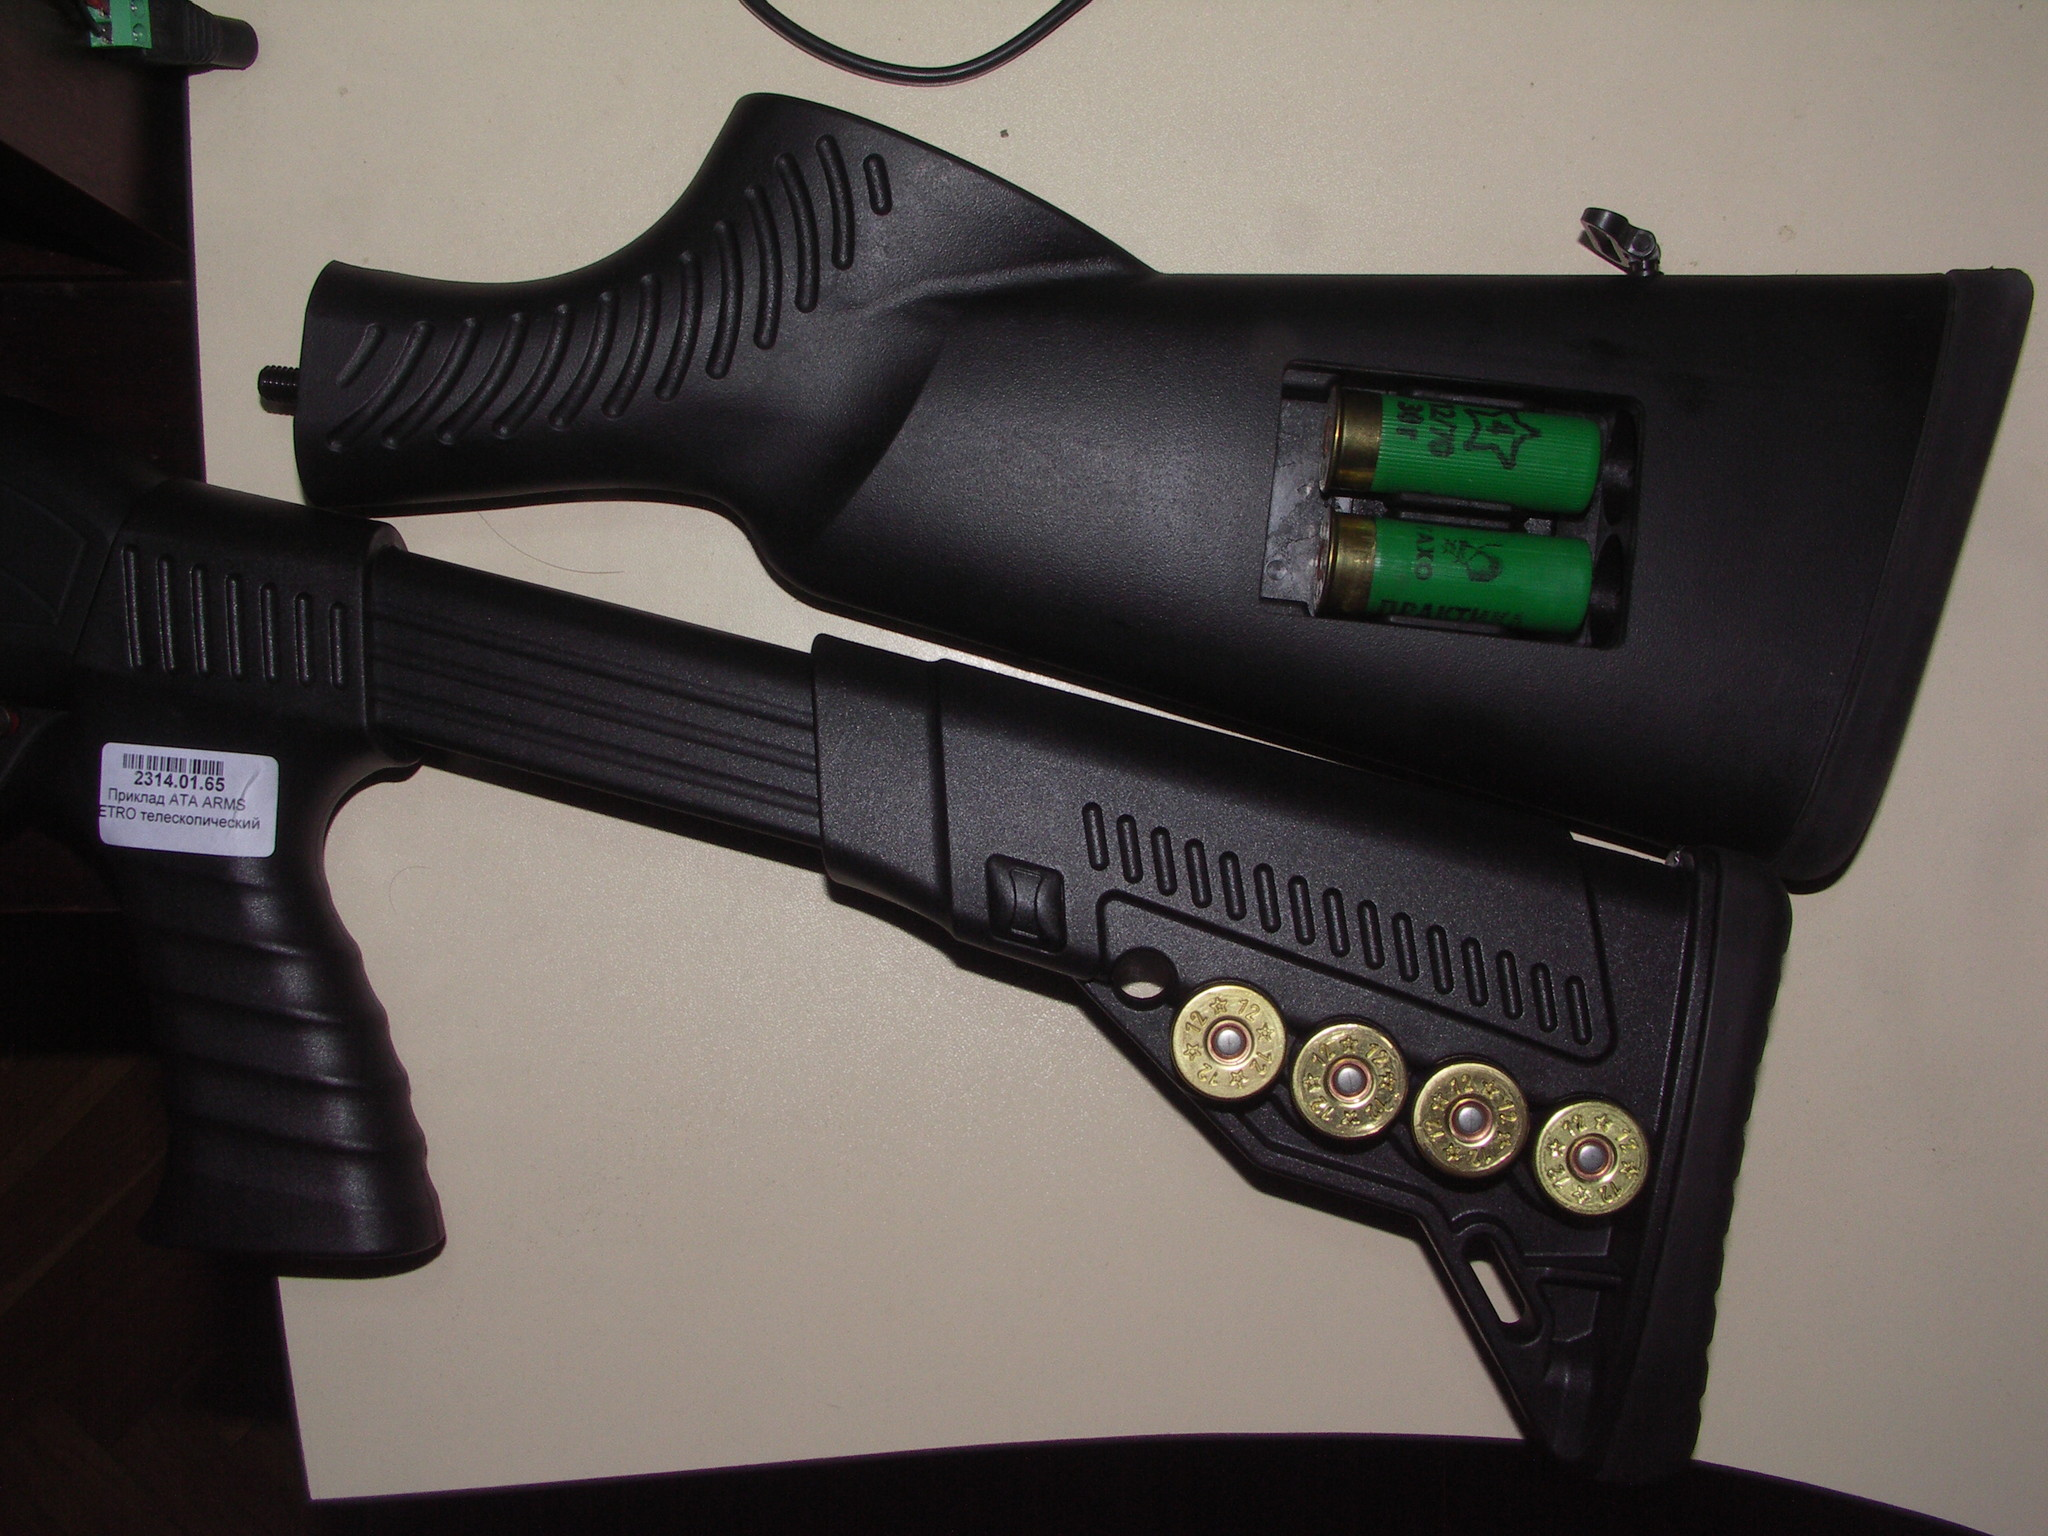 h-7850.jpg